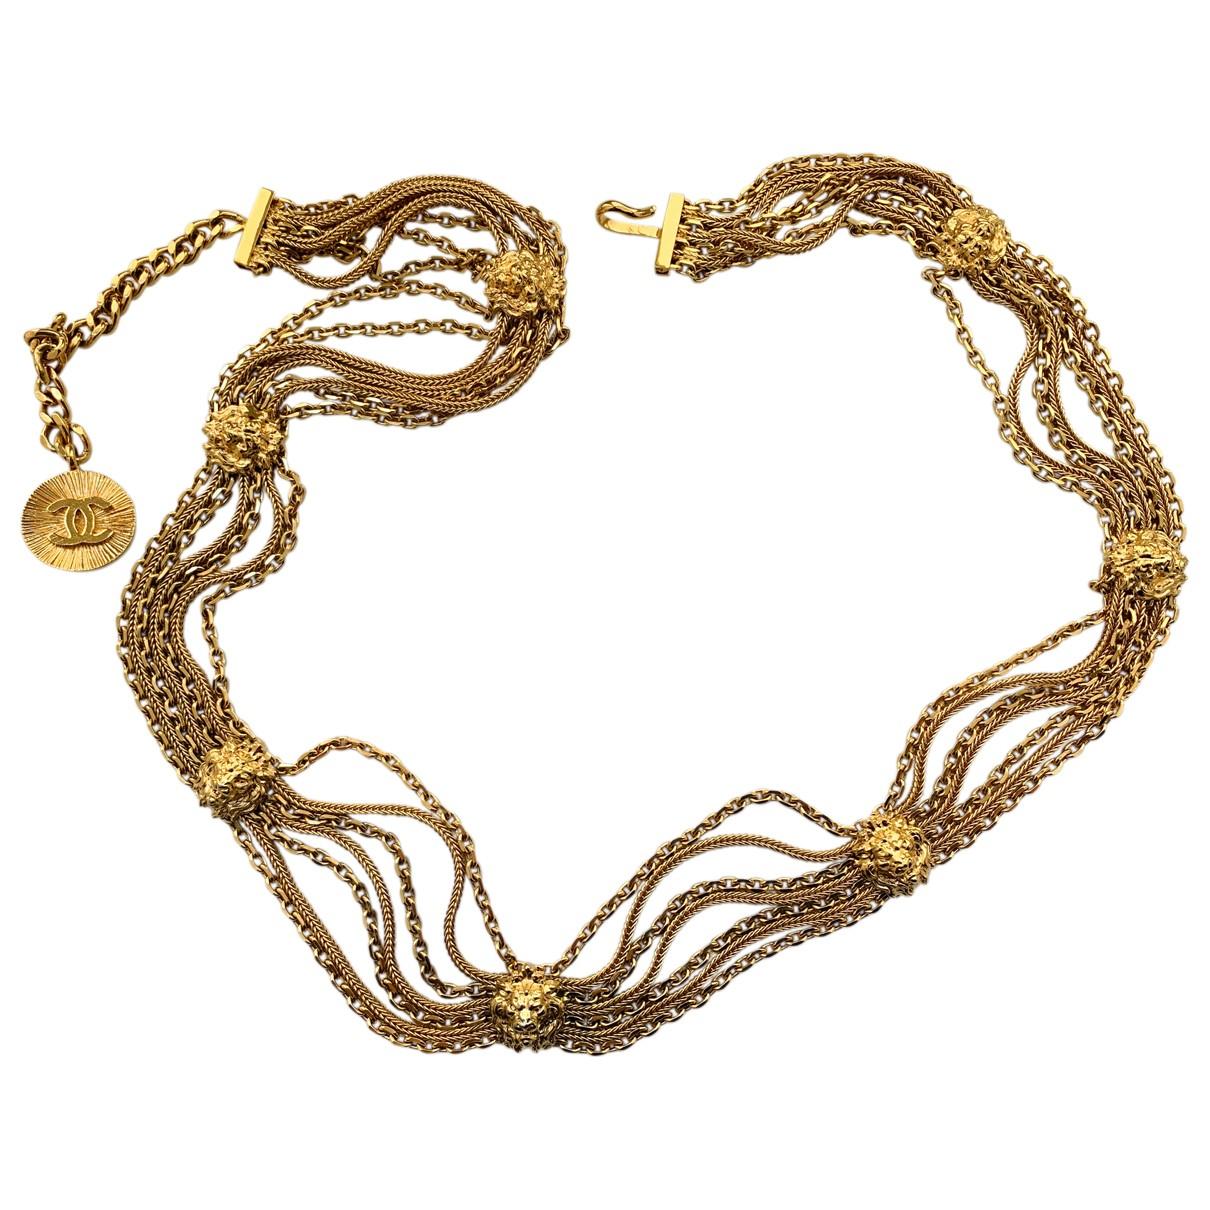 Chanel \N Gold Chain belt for Women 95 cm